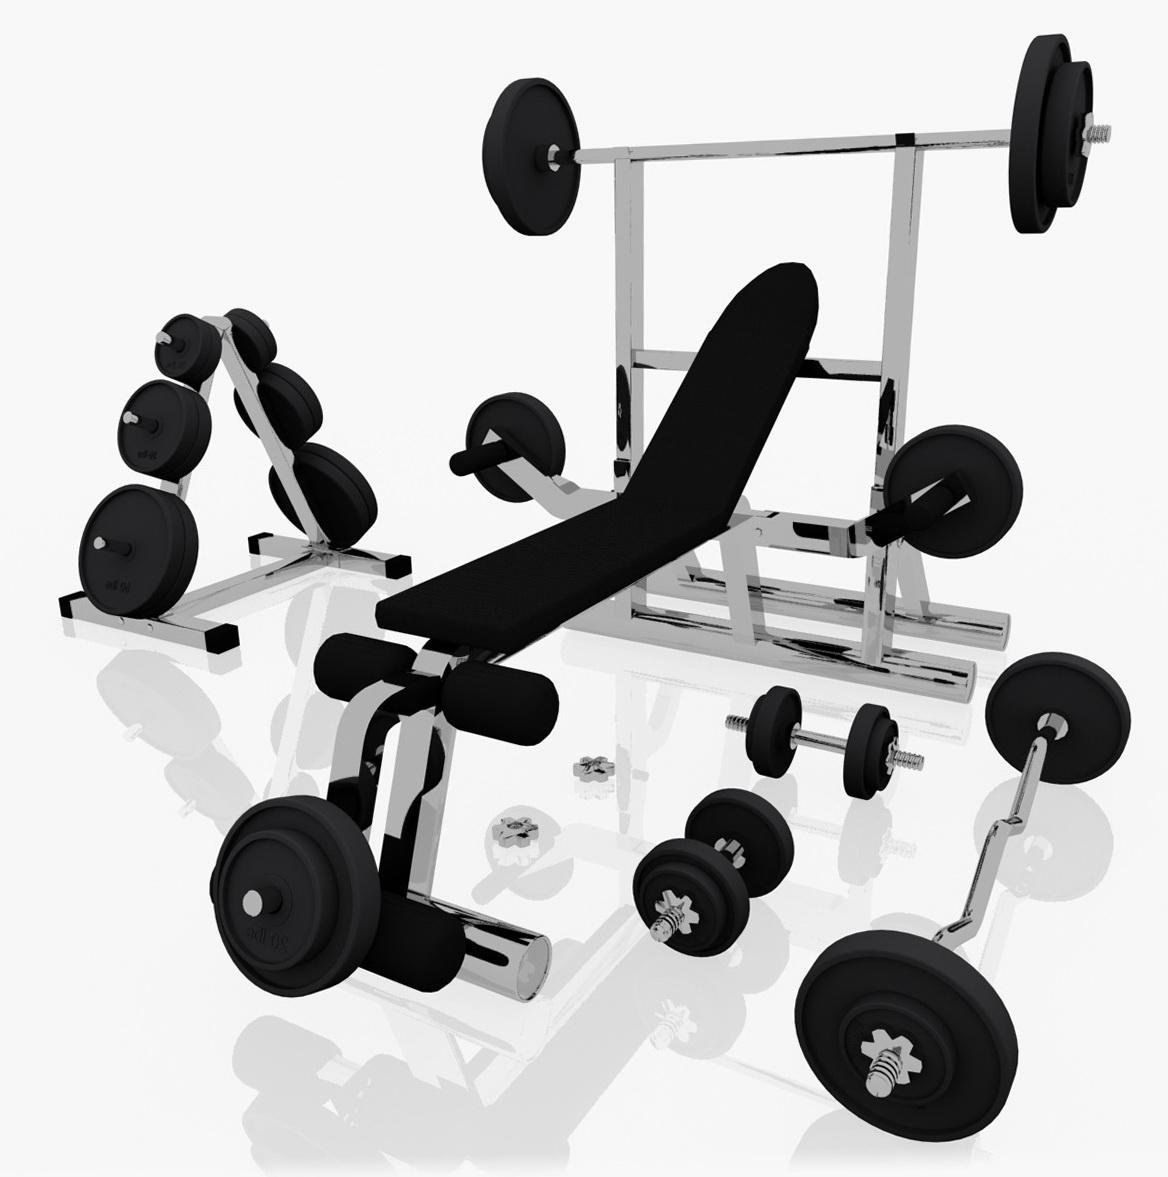 Bench Press Machine Workout